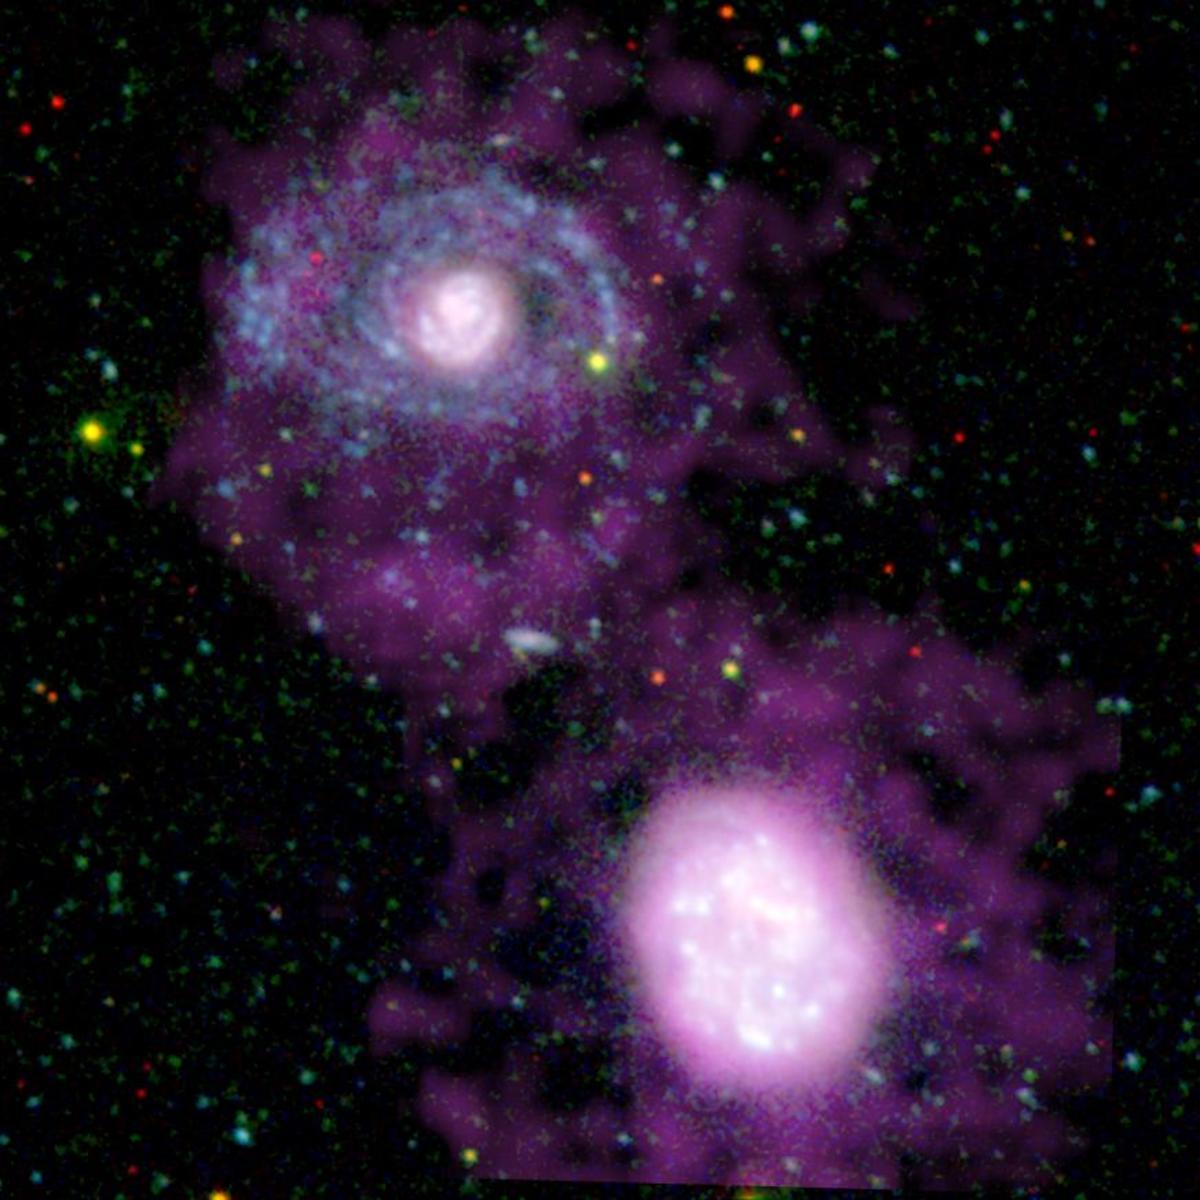 elliptical galaxies football shaped - photo #11